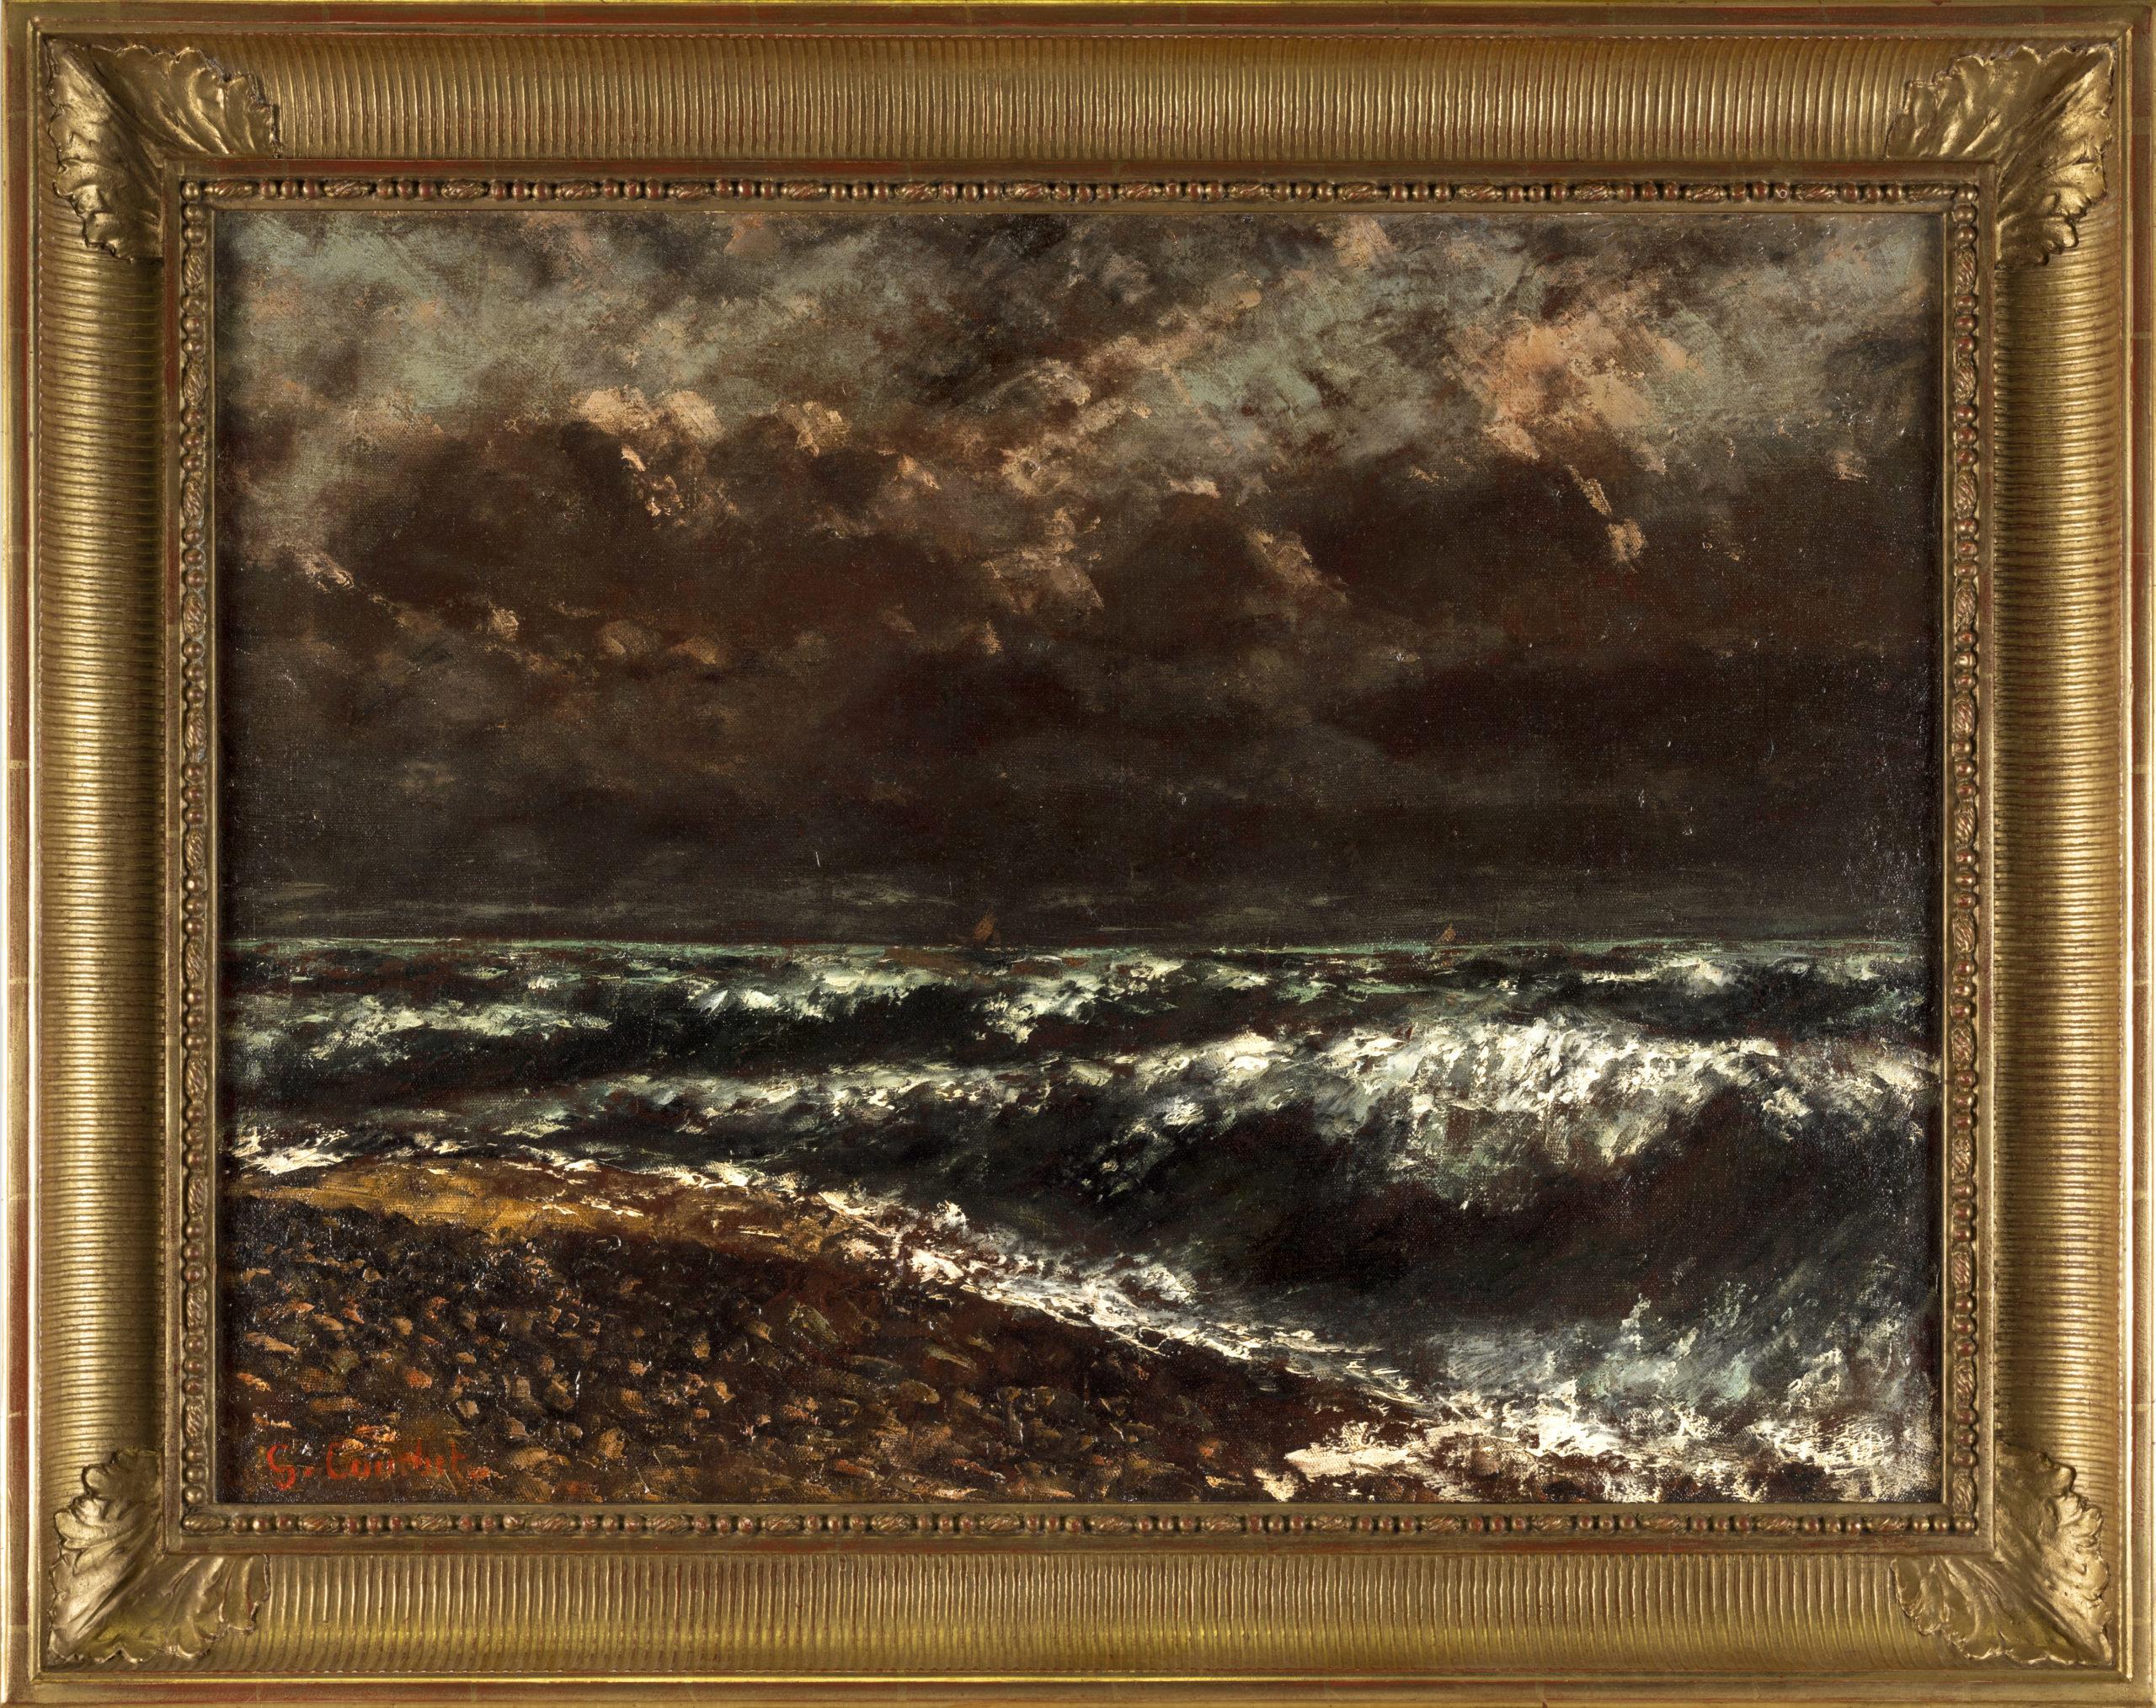 Welle auf dem Genfersee, 1877, Musée Jenisch Vevey  © Musée Jenisch Vevey. Photos: Julien Gremaud